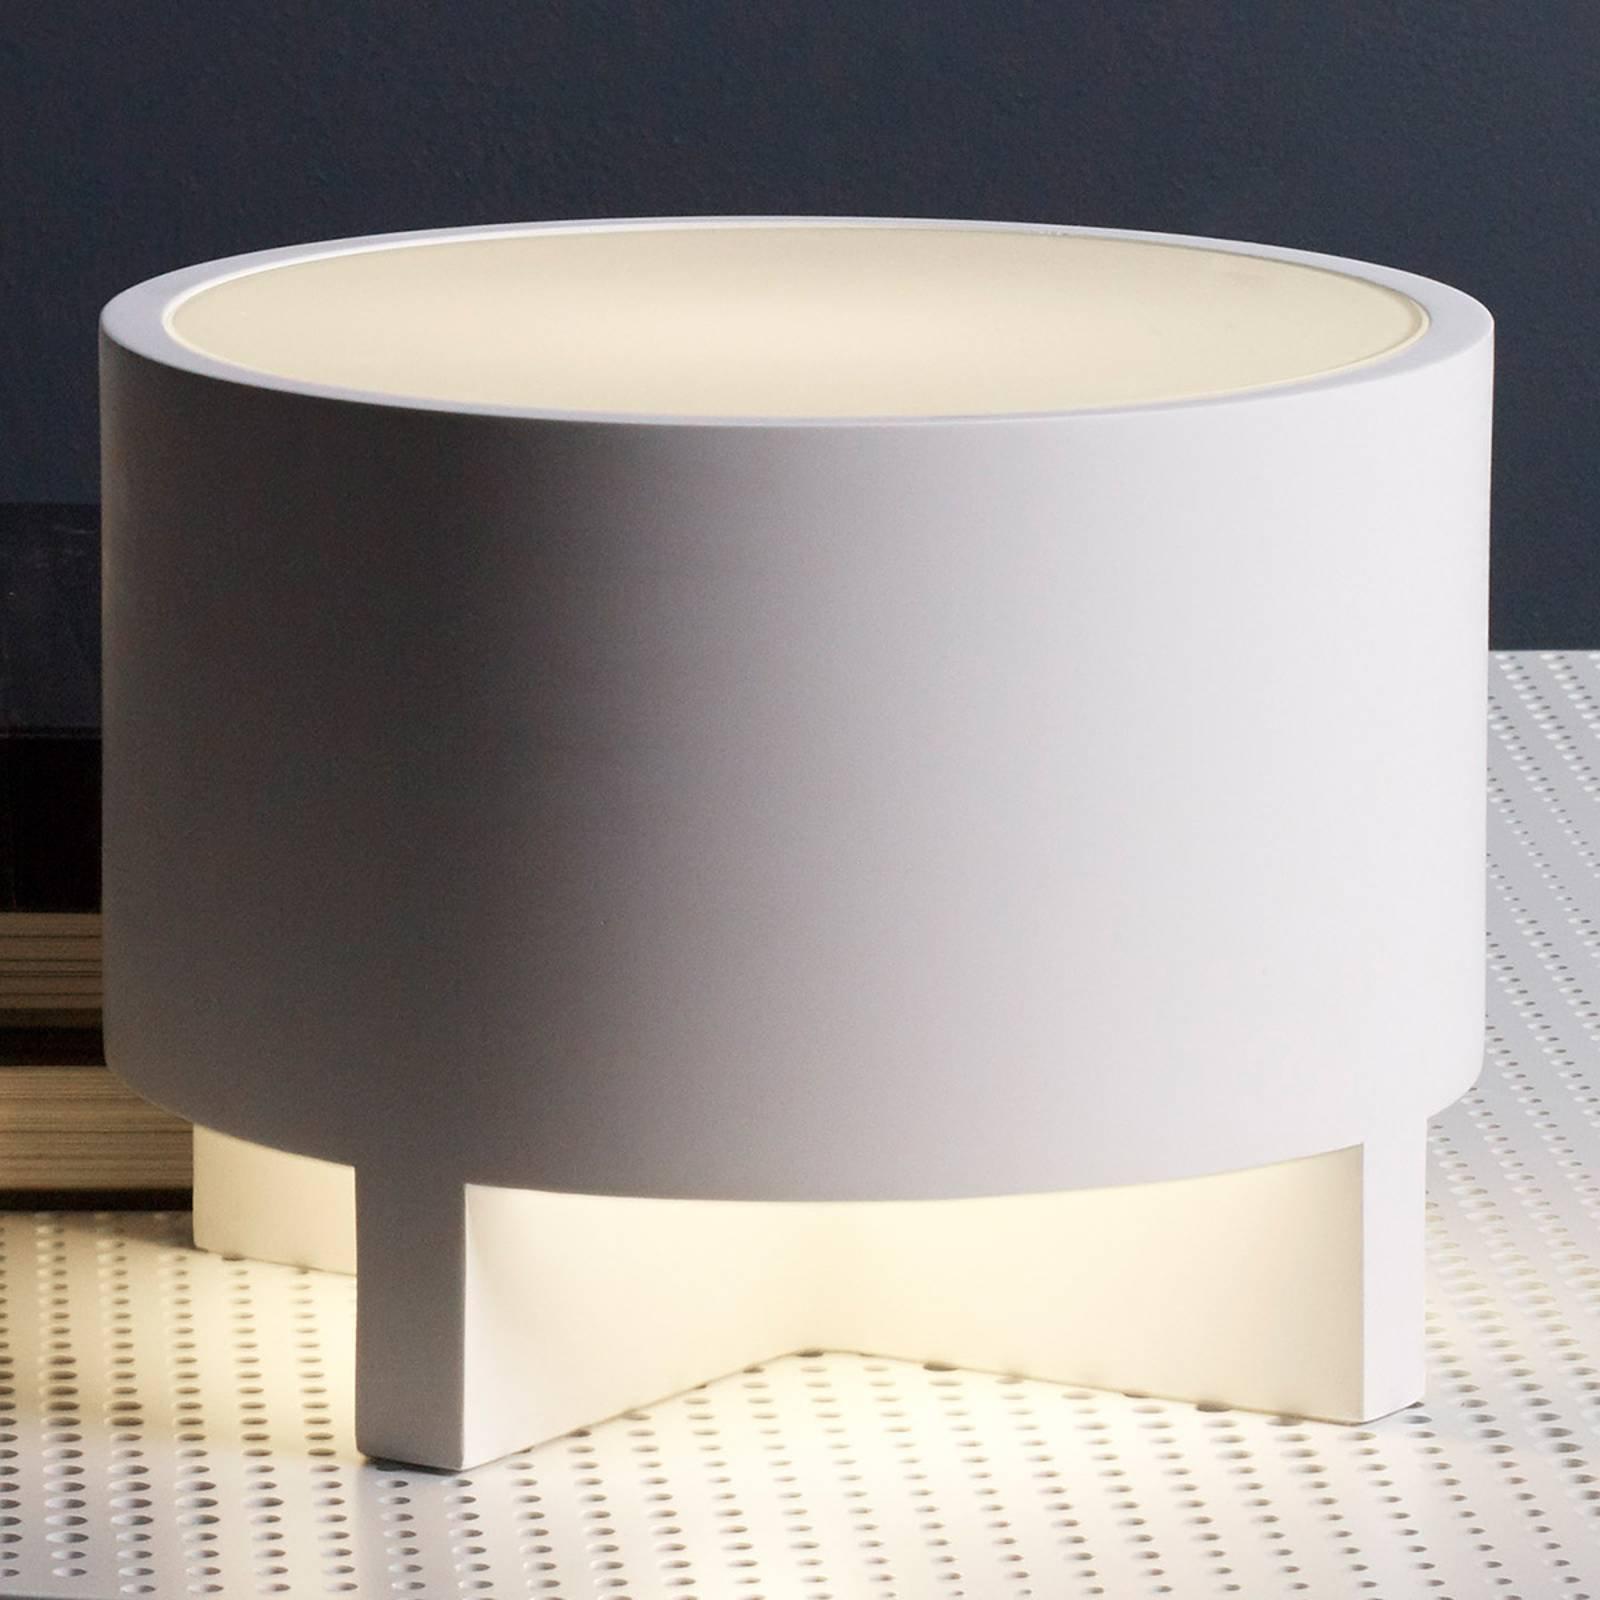 Astro Martello bordlampe Ø 24 cm